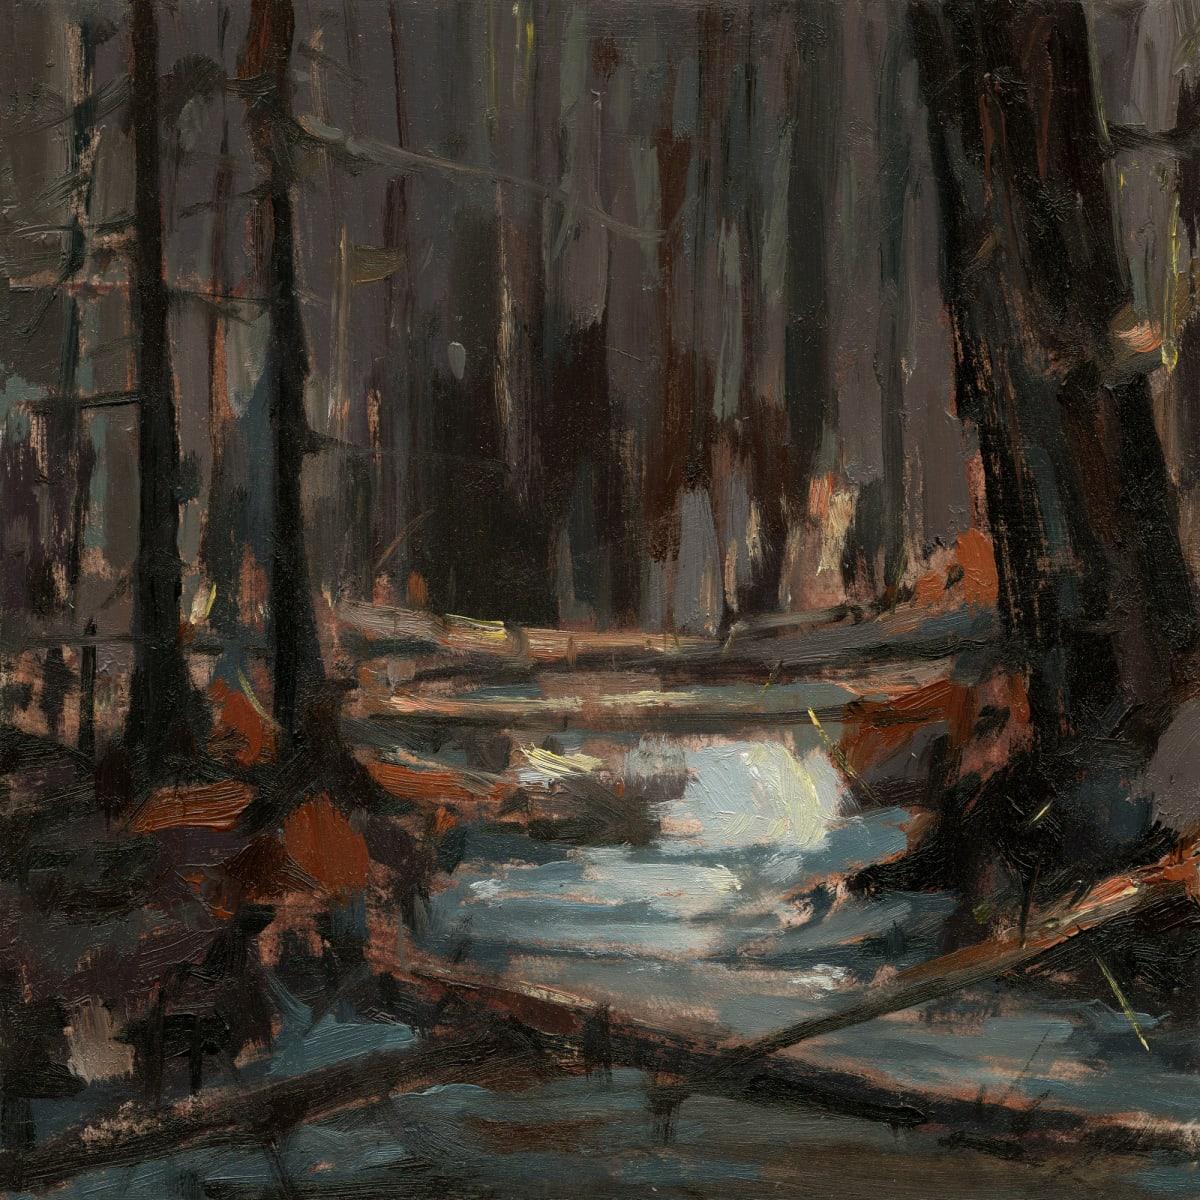 Jared Shear, Dark Waters, 2019